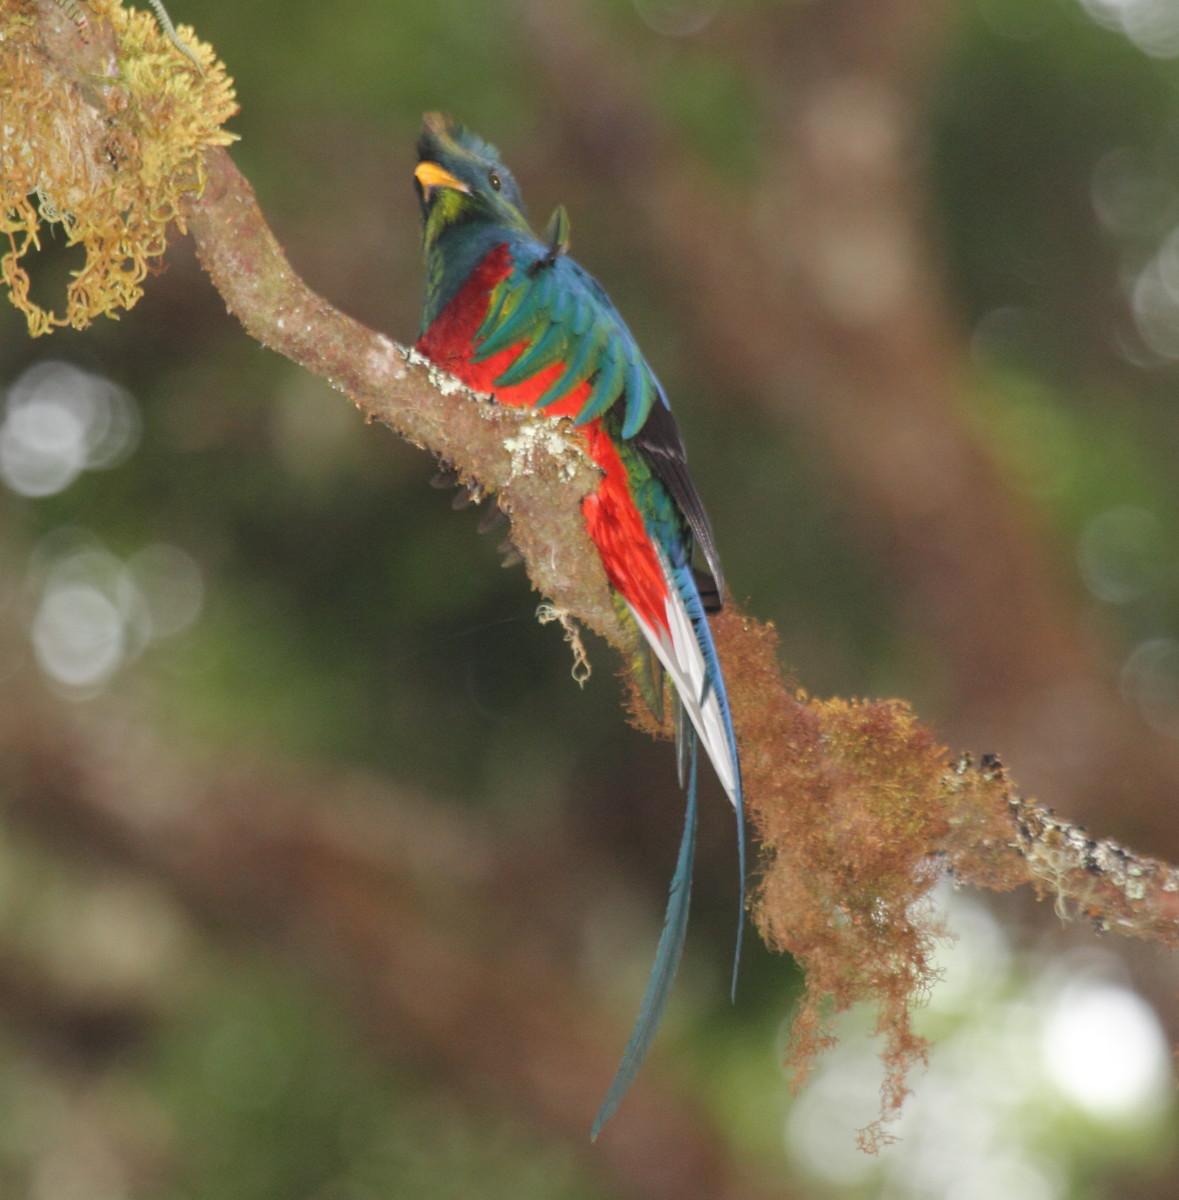 The Resplendent Quetzal has spectacular coloration.